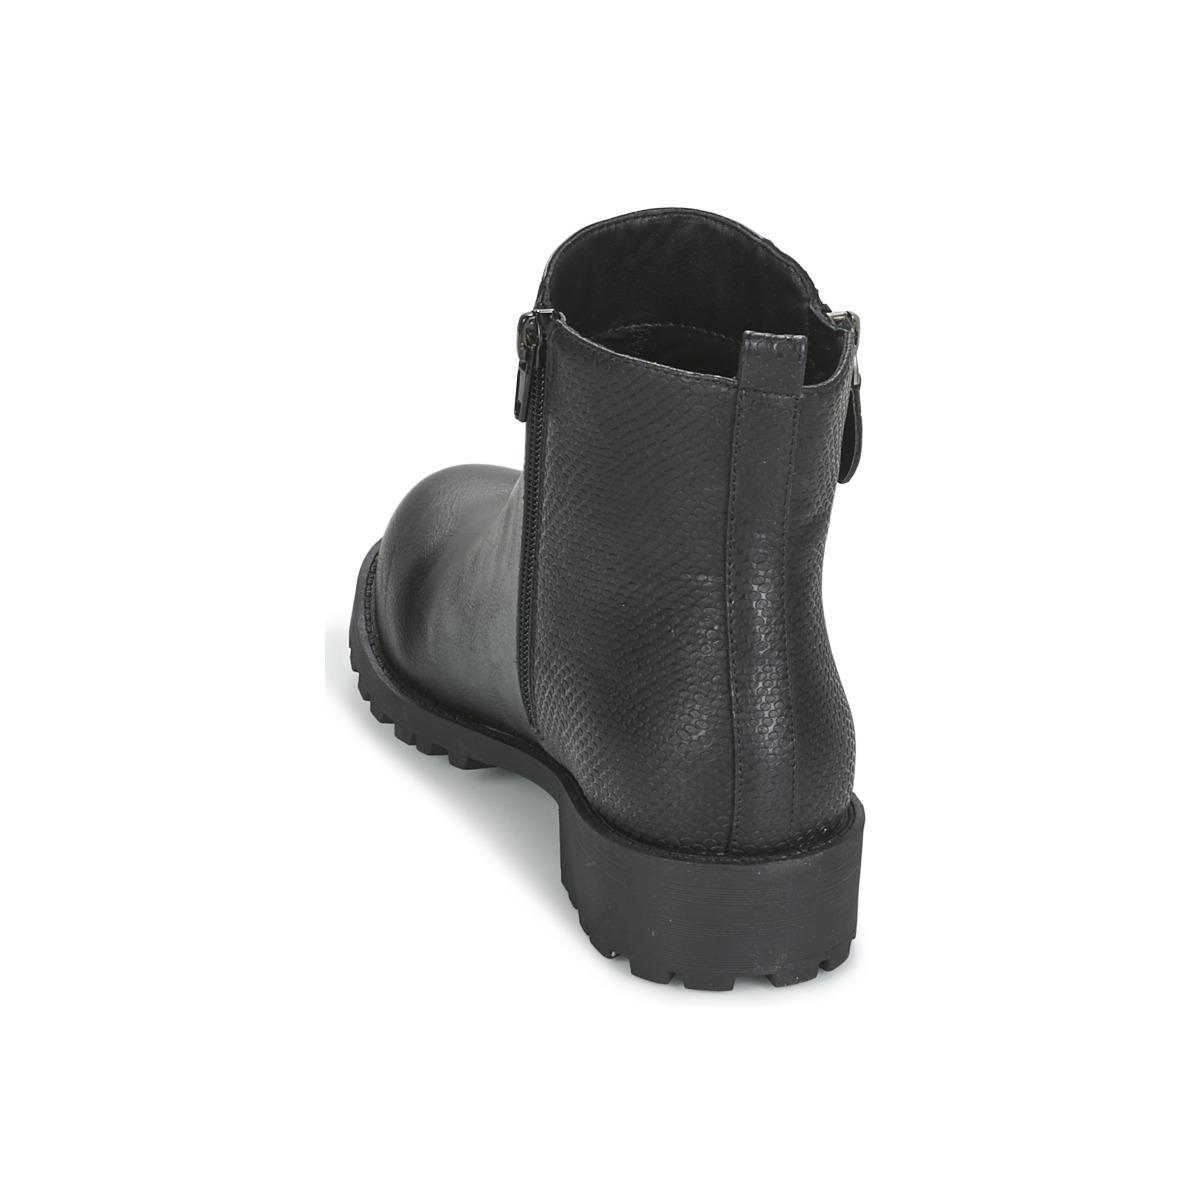 Moony Mood Synthetic Fiju Mid Boots in Black